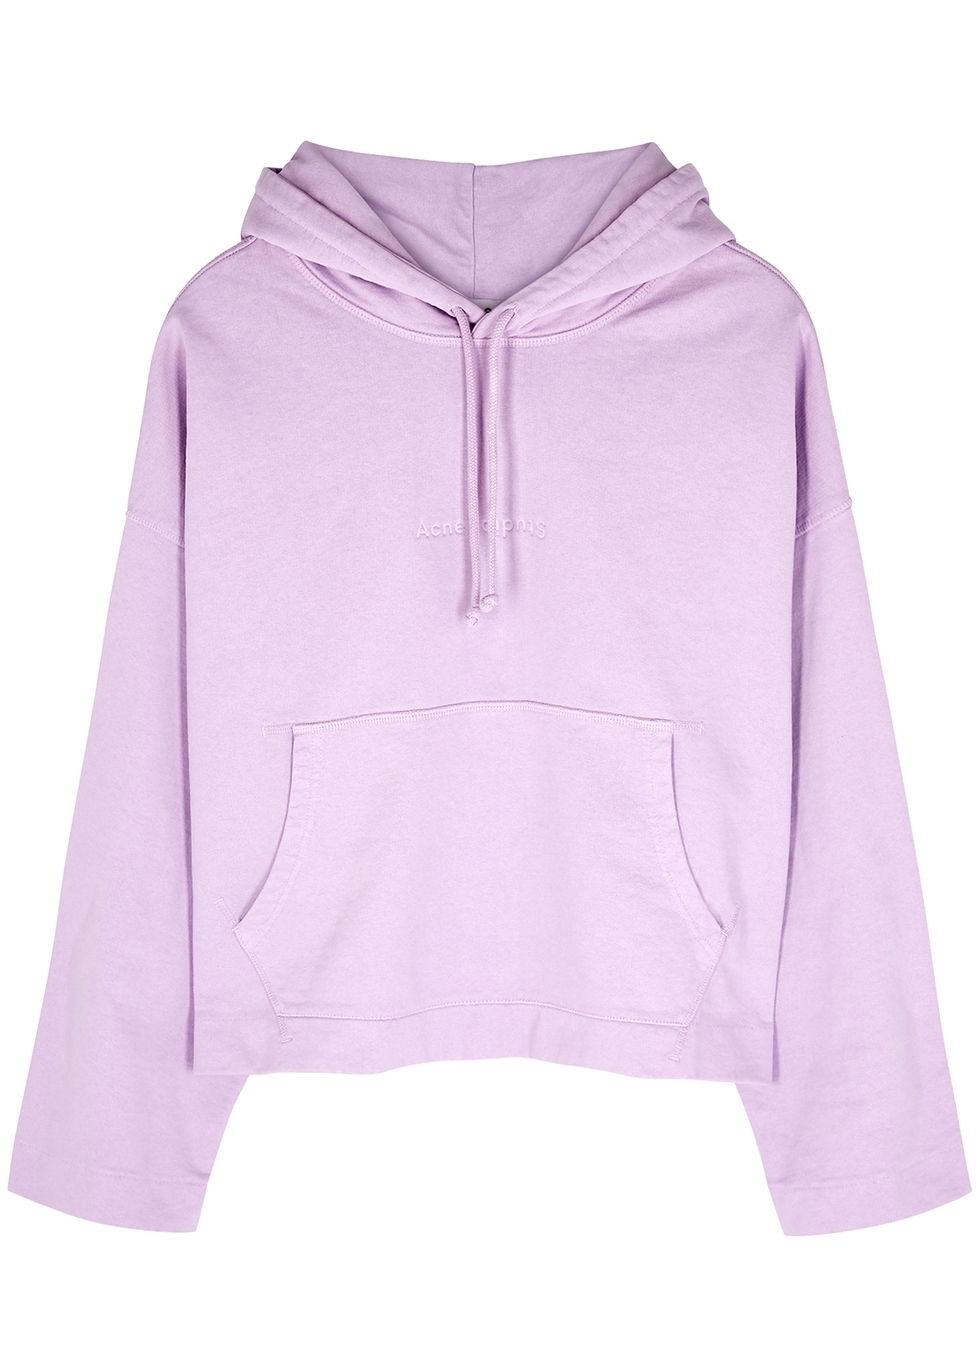 941910a70 Women's Designer Sweatshirts, Hoodies & Sweaters - Harvey Nichols